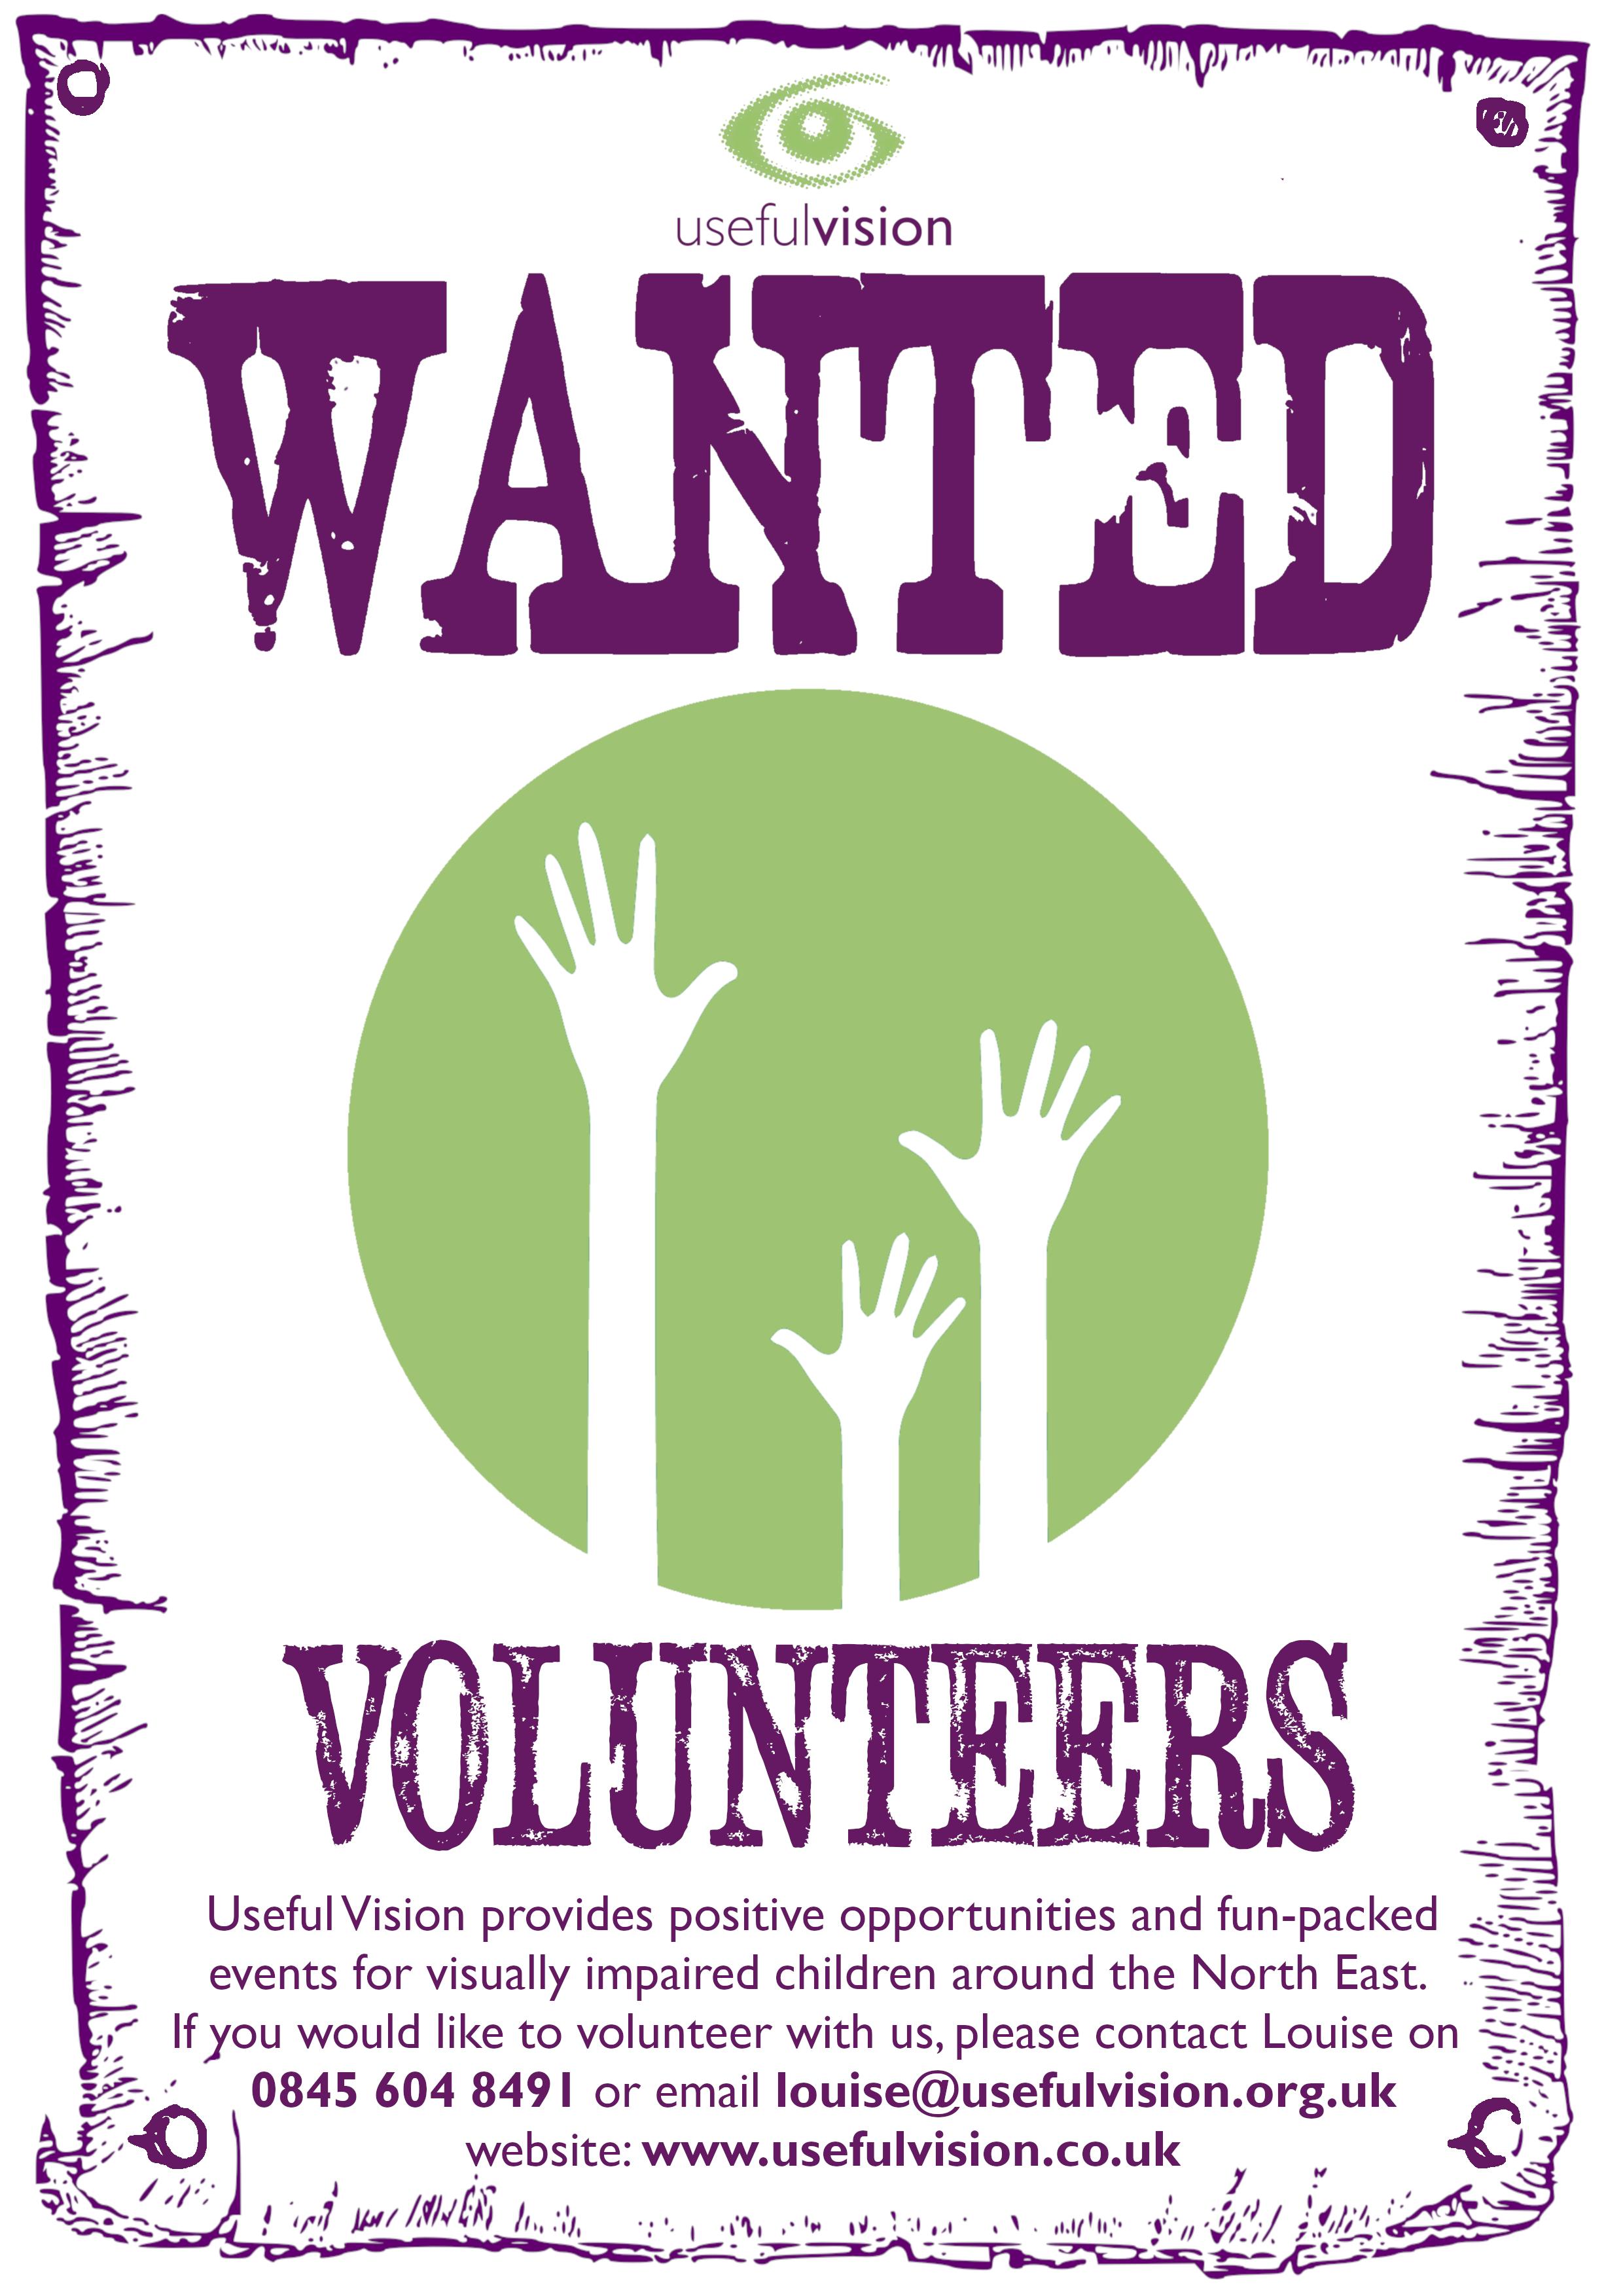 Volunteers Wanted Poster